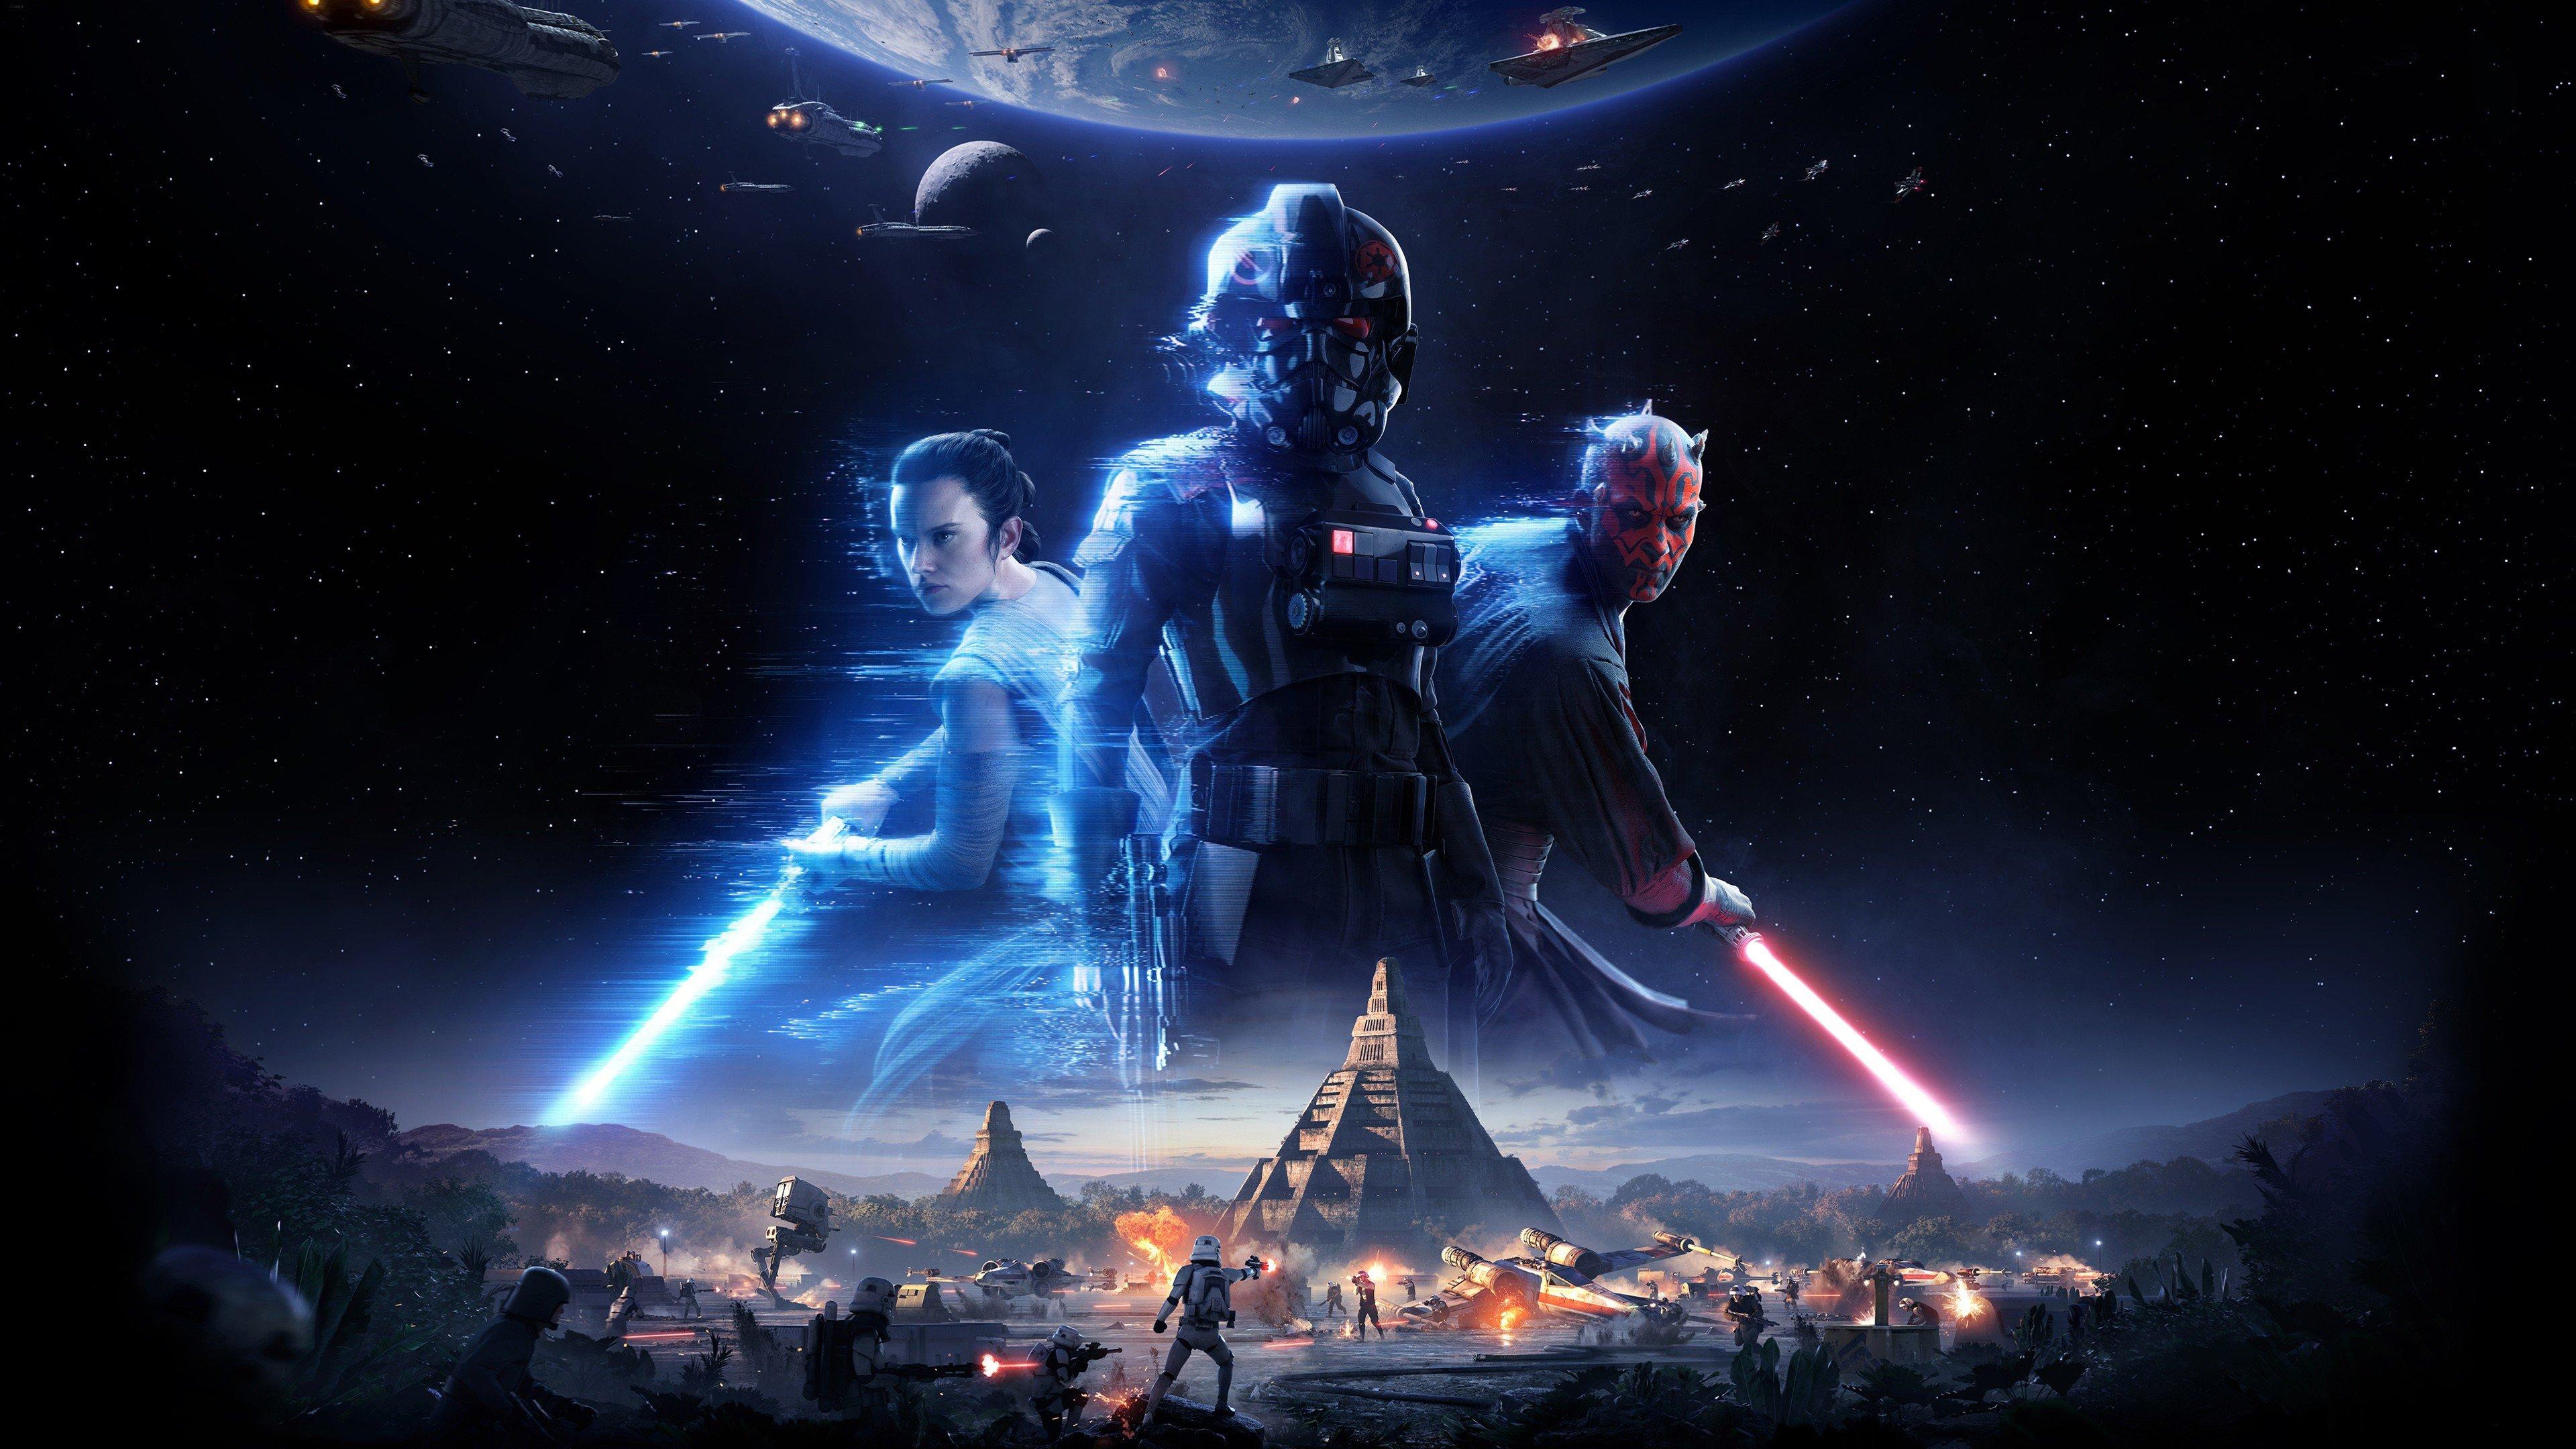 Wallpaper 3840x2160 Px Star Wars Star Wars Battlefront Ii Star Wars Battlefront Video Games 3840x2160 4kwallpaper 1325079 Hd Wallpapers Wallhere